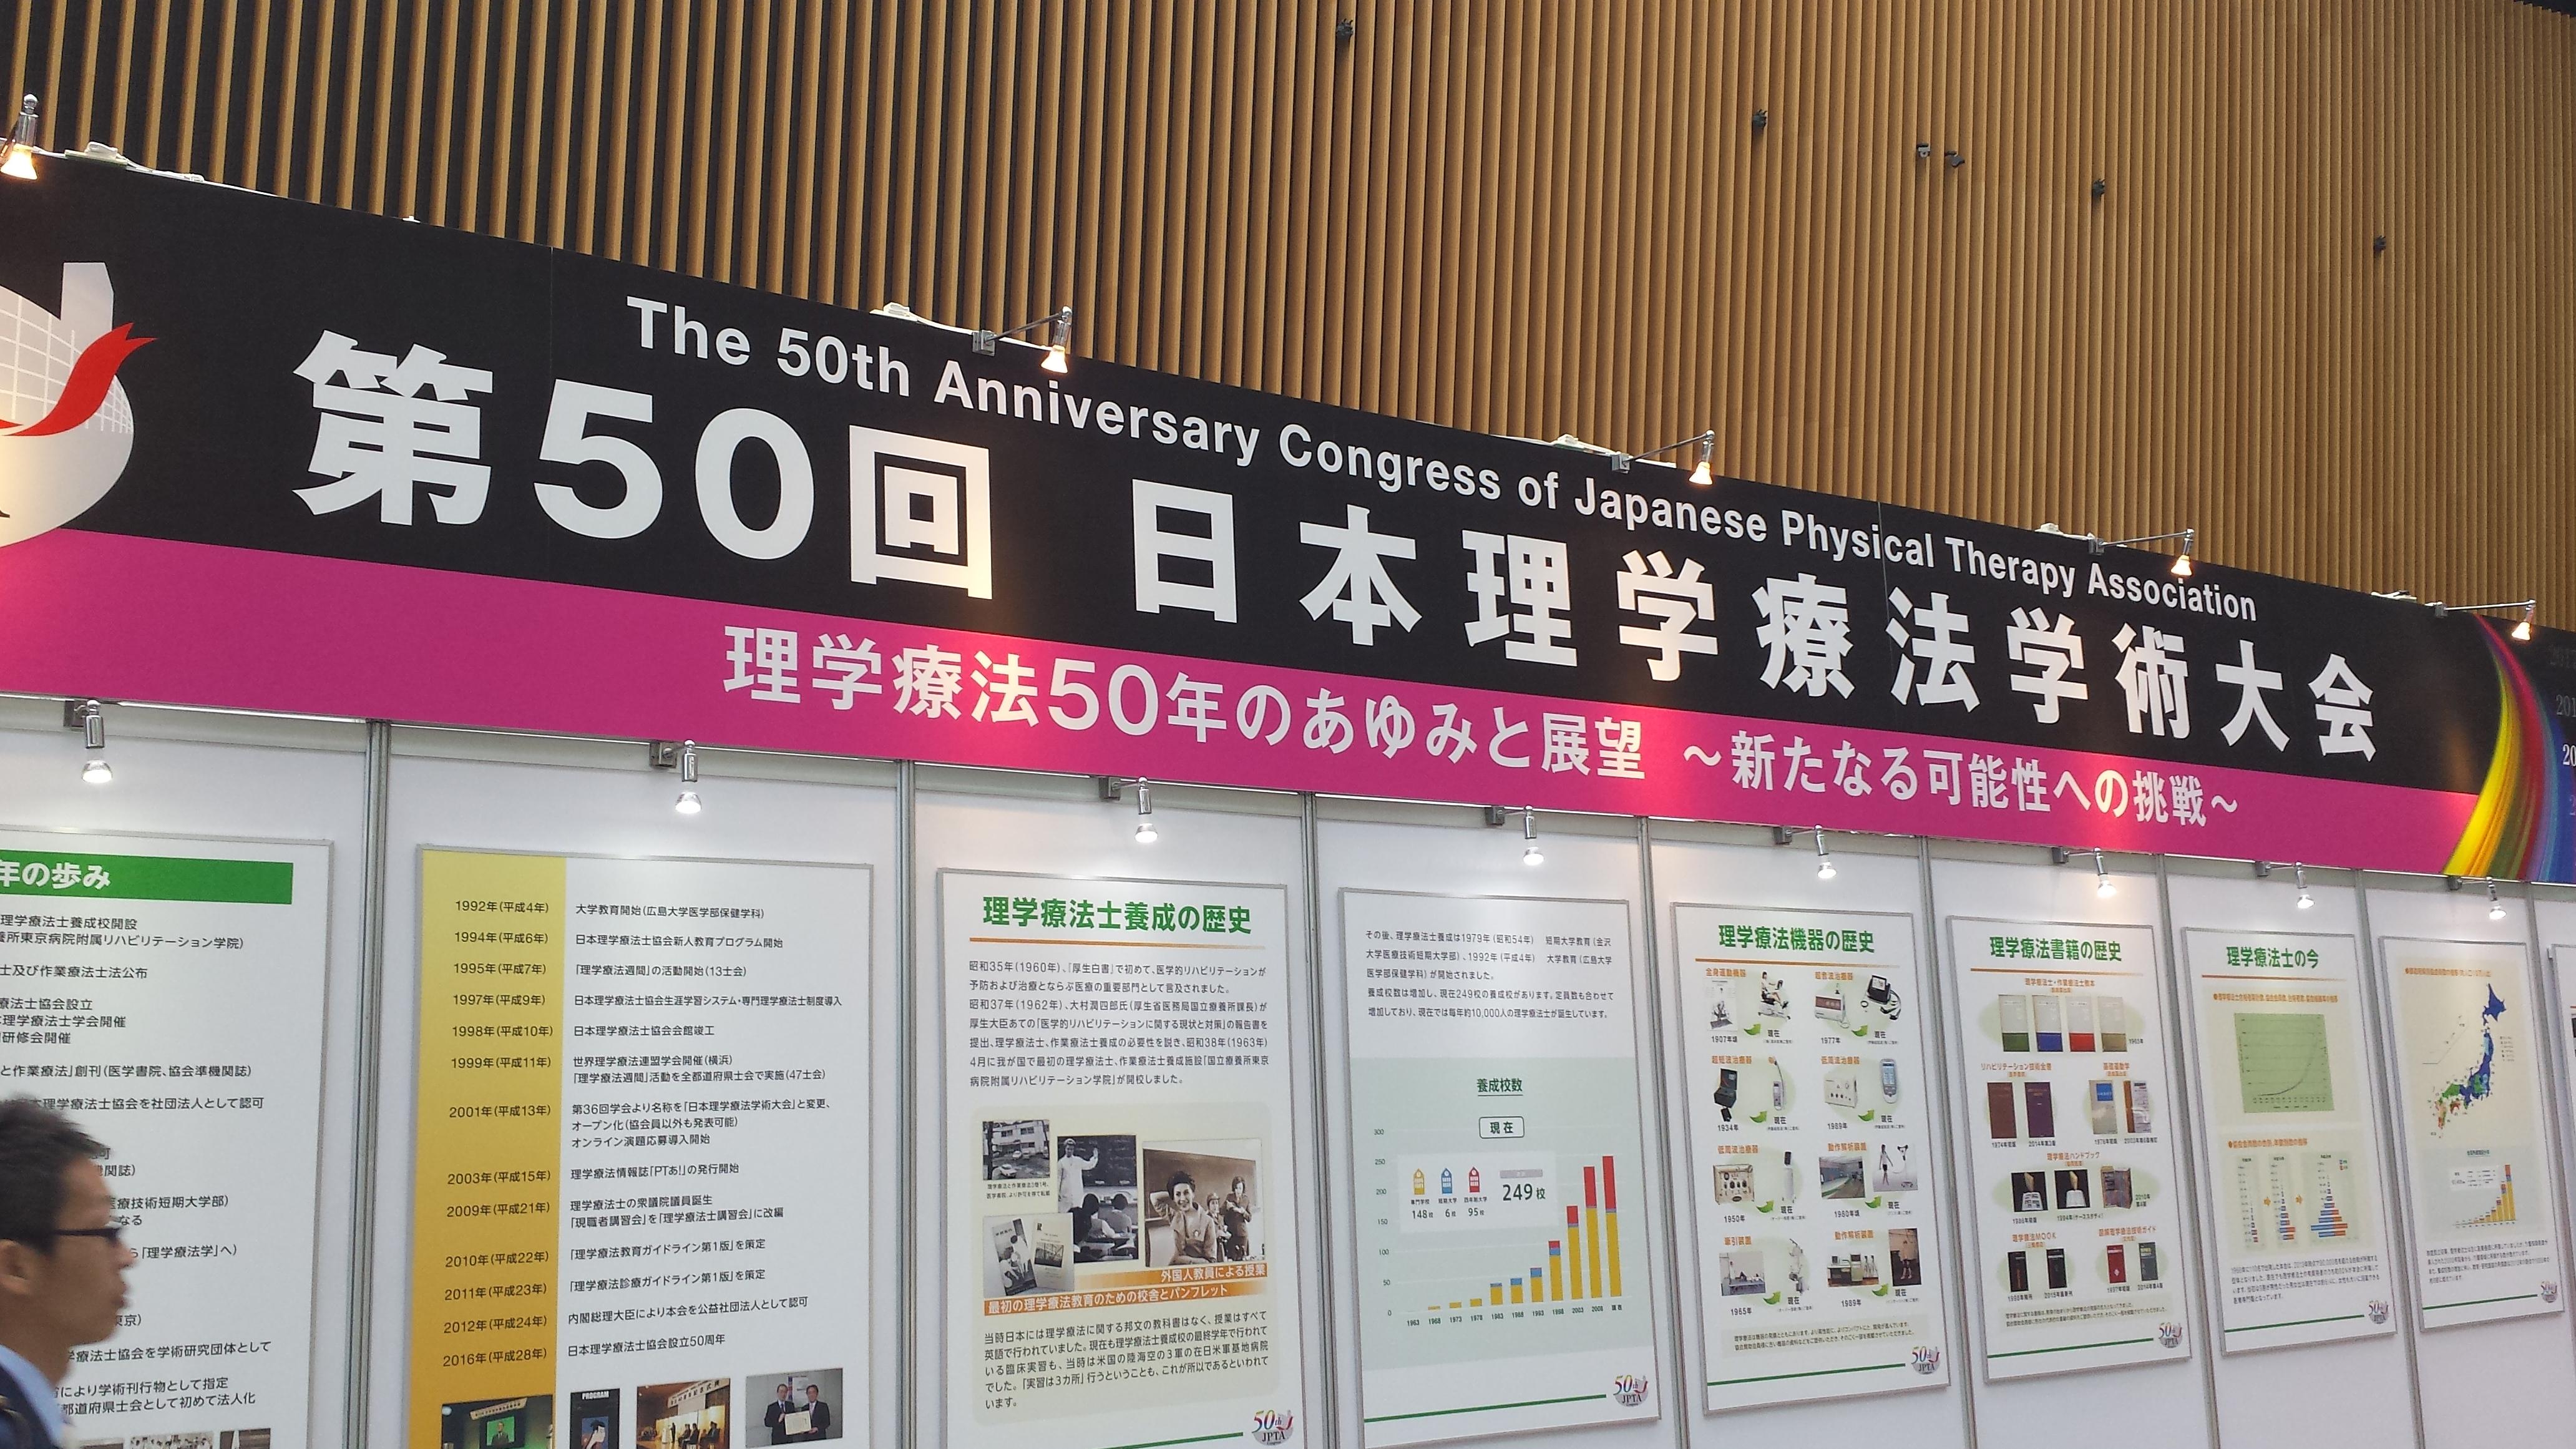 Nクリニック 活動報告カテゴリー別アーカイブ: 学術活動第1回足の構造と機能研究会学術集会で沼澤が研究発表を行いました。第2回MKPT学術大会で野田が研究発表しました先日、東京で開催された「スポーツ選手のためのリハビリテーション研究会」にて、当院理学療法士の沼澤が口述発表を行いました。第52回日本理学療法学術大会に参加してきました第27回日本臨床スポーツ医学会学術集会に参加してきました。第51回日本理学療法学術大会に参加してきました第26回日本臨床スポーツ医学会学術集会第70回日本体力医学会大会第50回日本理学療法学術大会に参加してきました